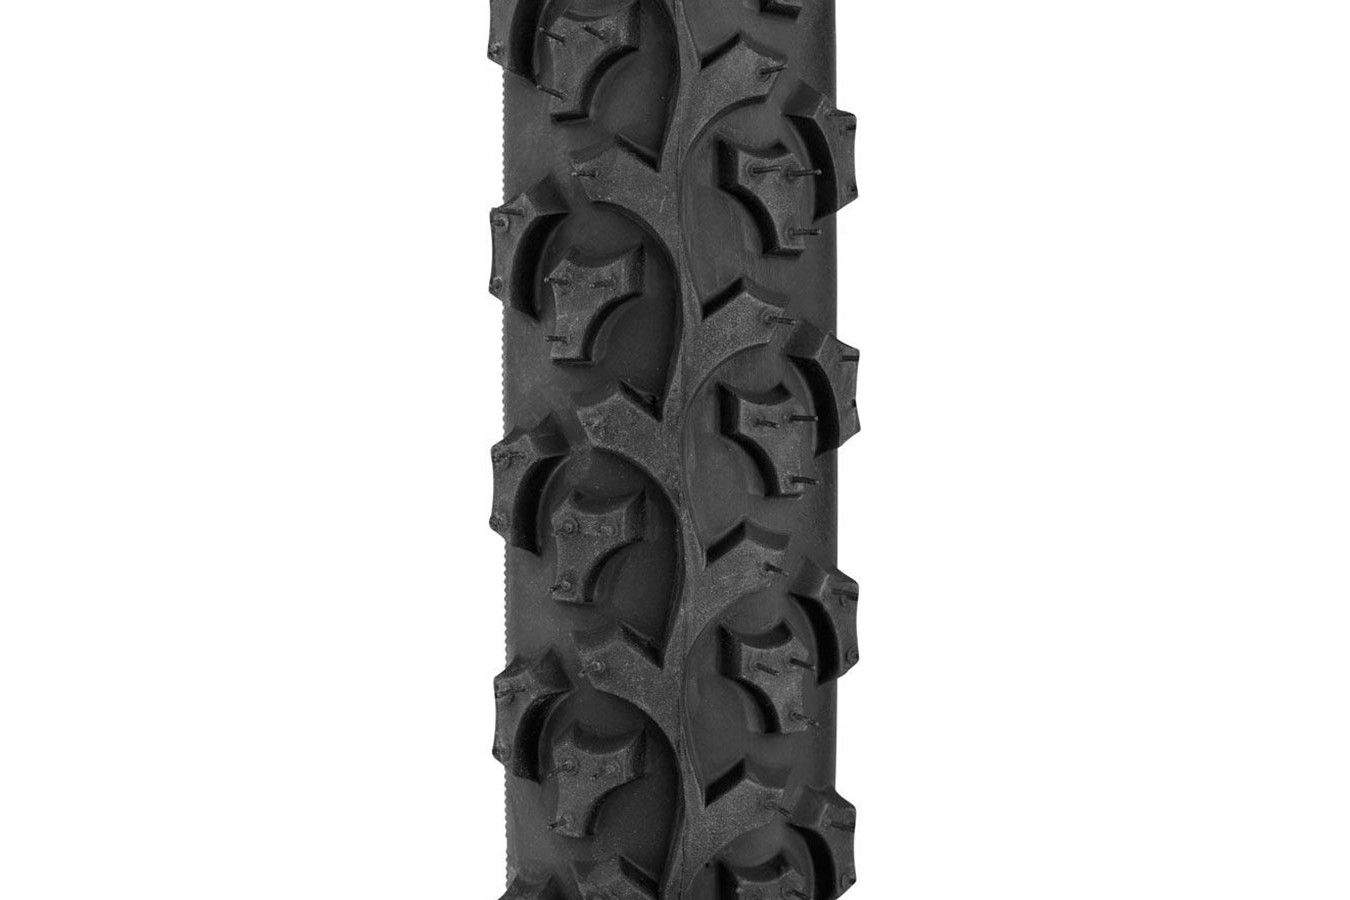 Pneu 24x1.75 (47x507) K.831 - Kenda